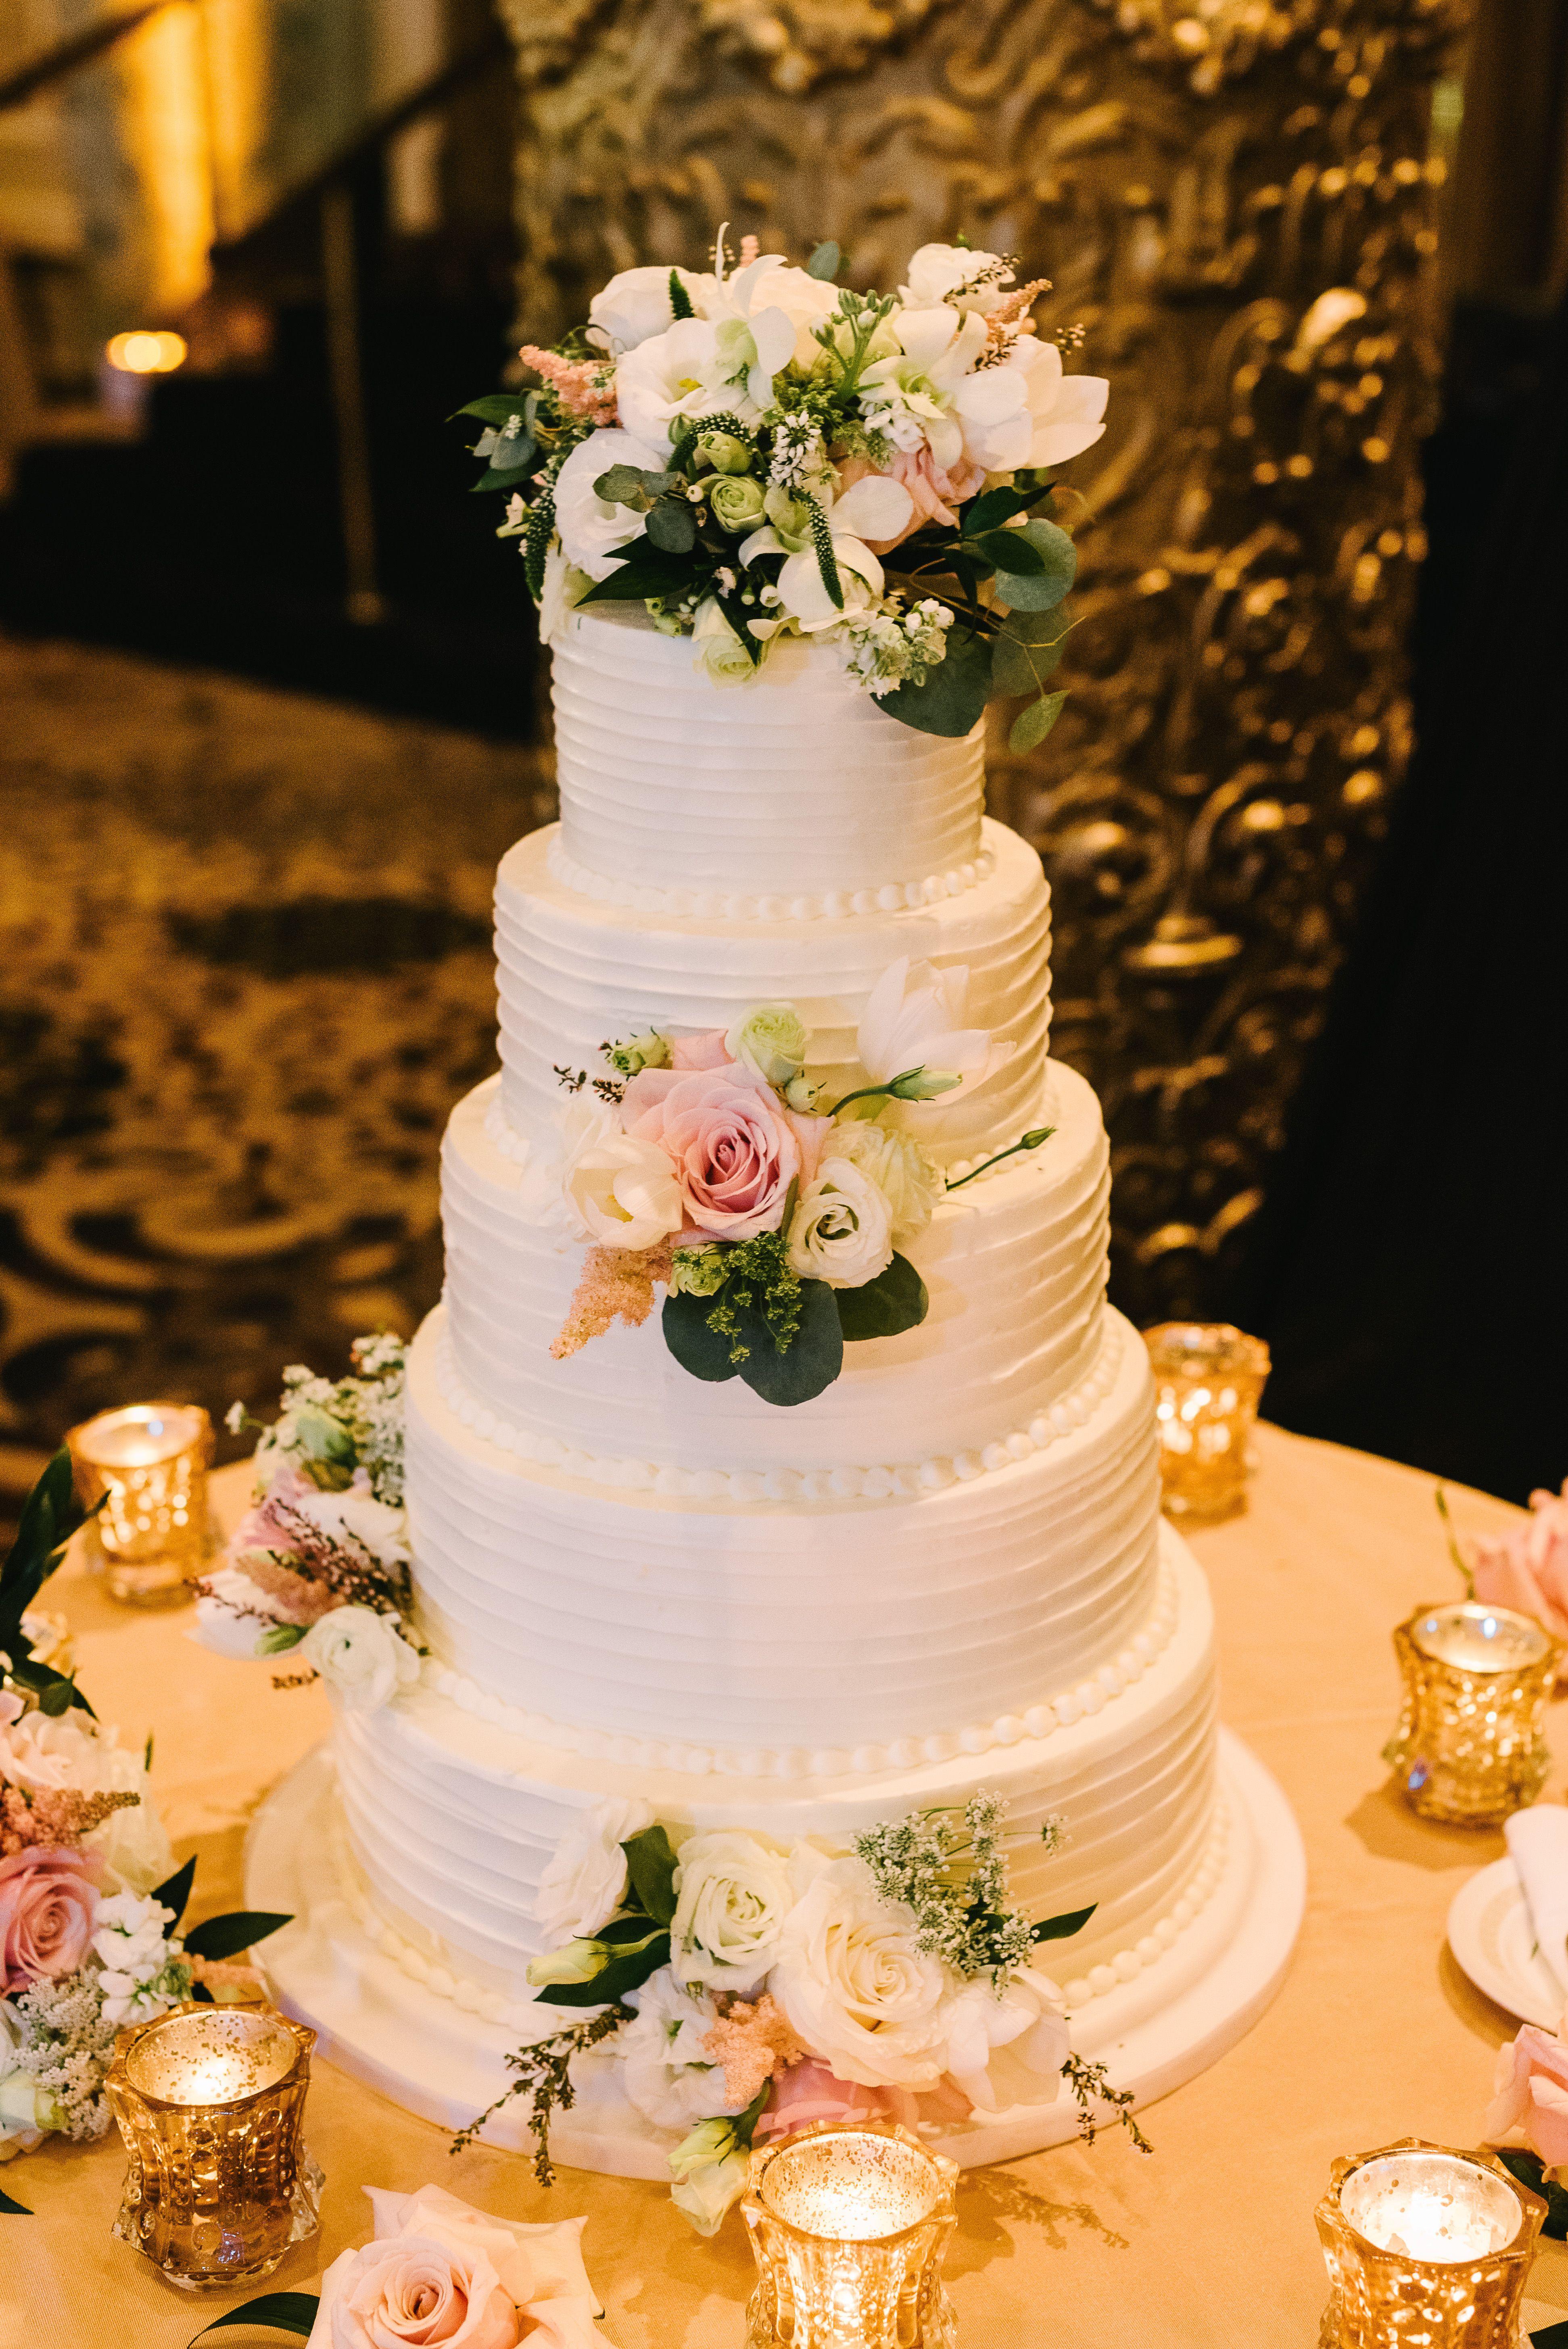 Wedding Decorations Newcastle Wedding Ideas Asian Wedding Cakes Likable Wedding Fl Wedding Cake Table Decorations Wedding Cake Decorations Wedding Cake Table